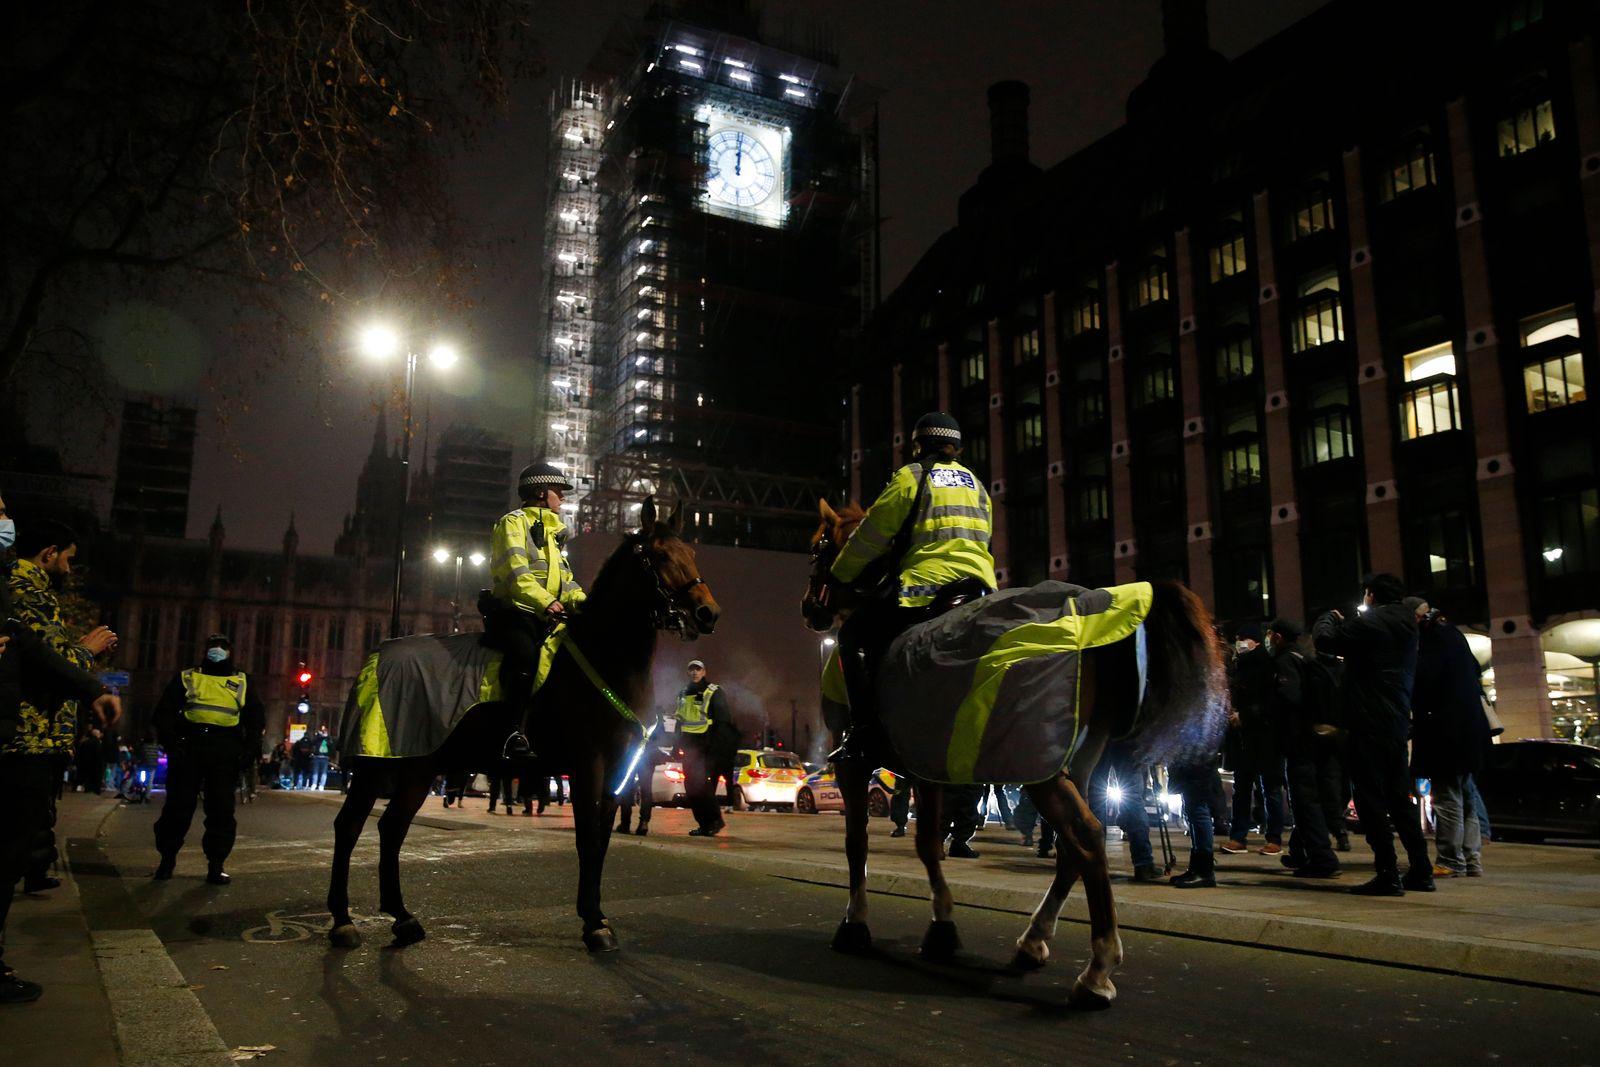 New Year's Eve In The UK During The Coronavirus Pandemic